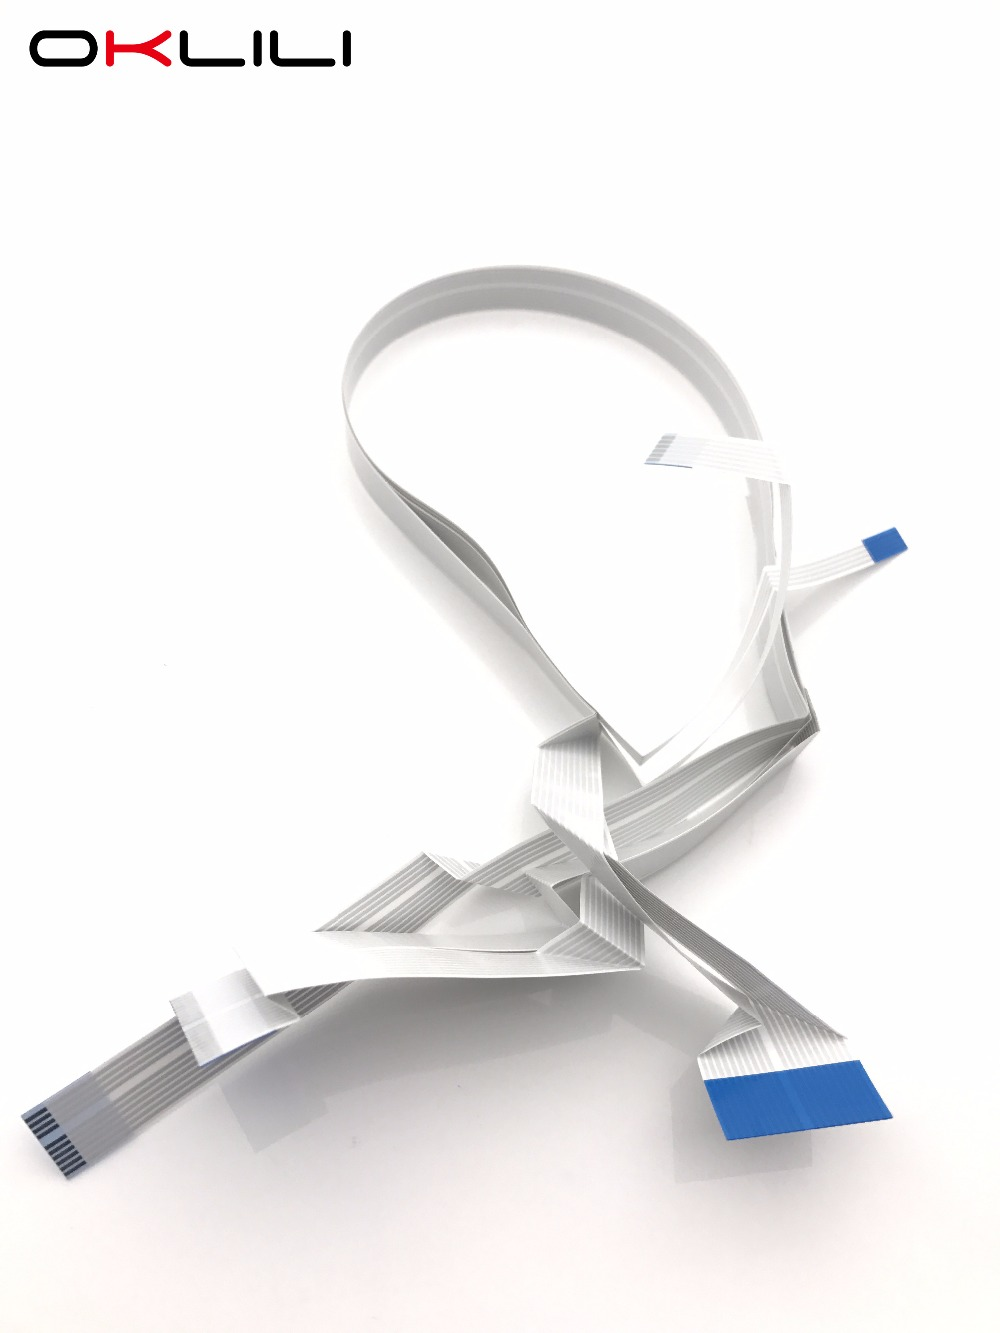 5X Printhead Printer Print head Cable for Epson CX3900 CX4300 CX5600 CX550 CX5500 L101 L201 L100 L200 C79 C90 BX300 BX305 SX125